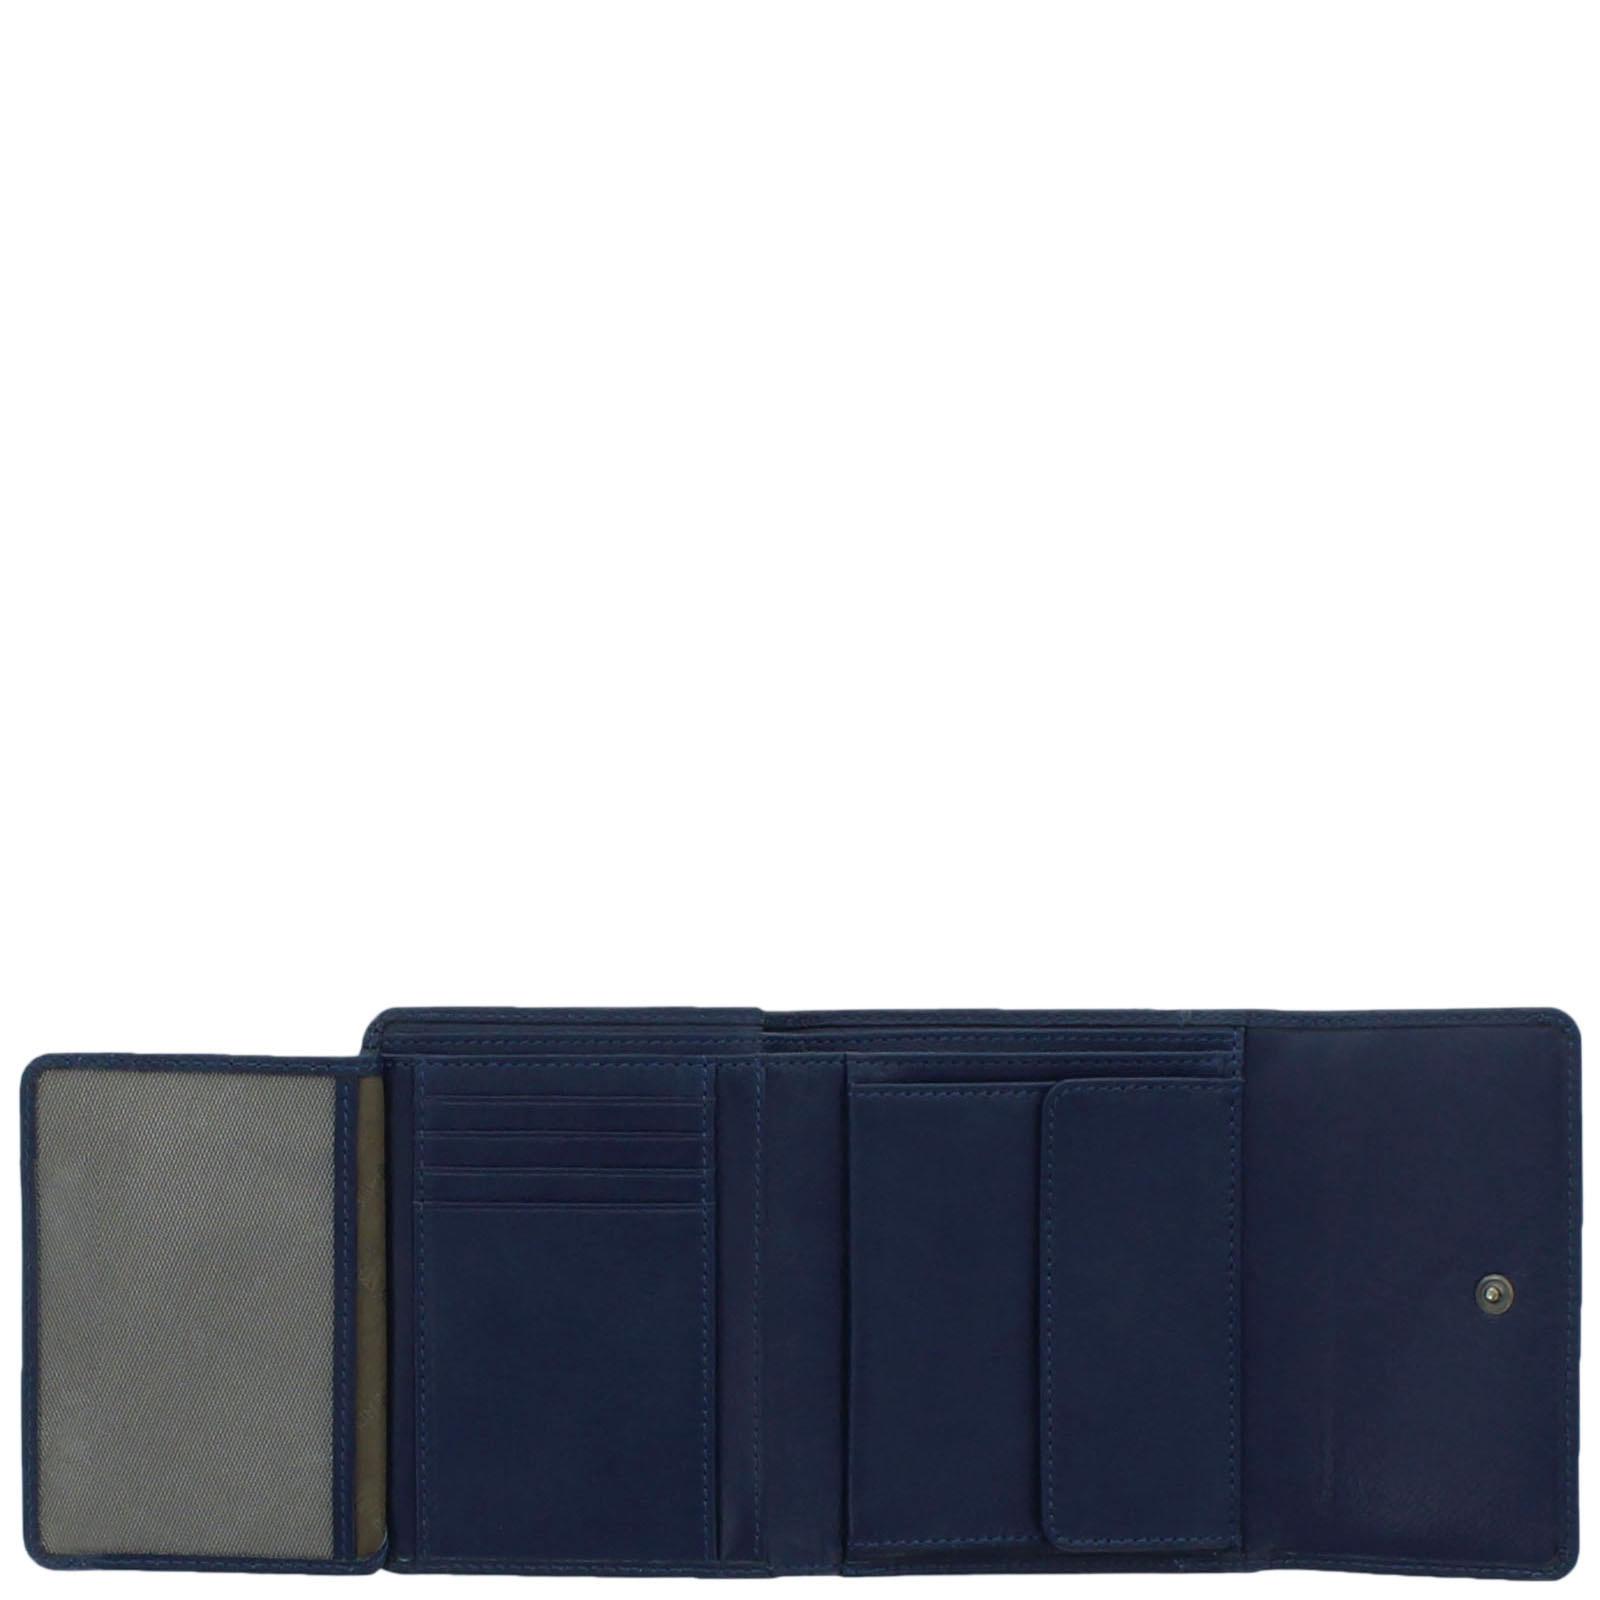 Портмоне Braun Bueffel Soave темно-синего цвета